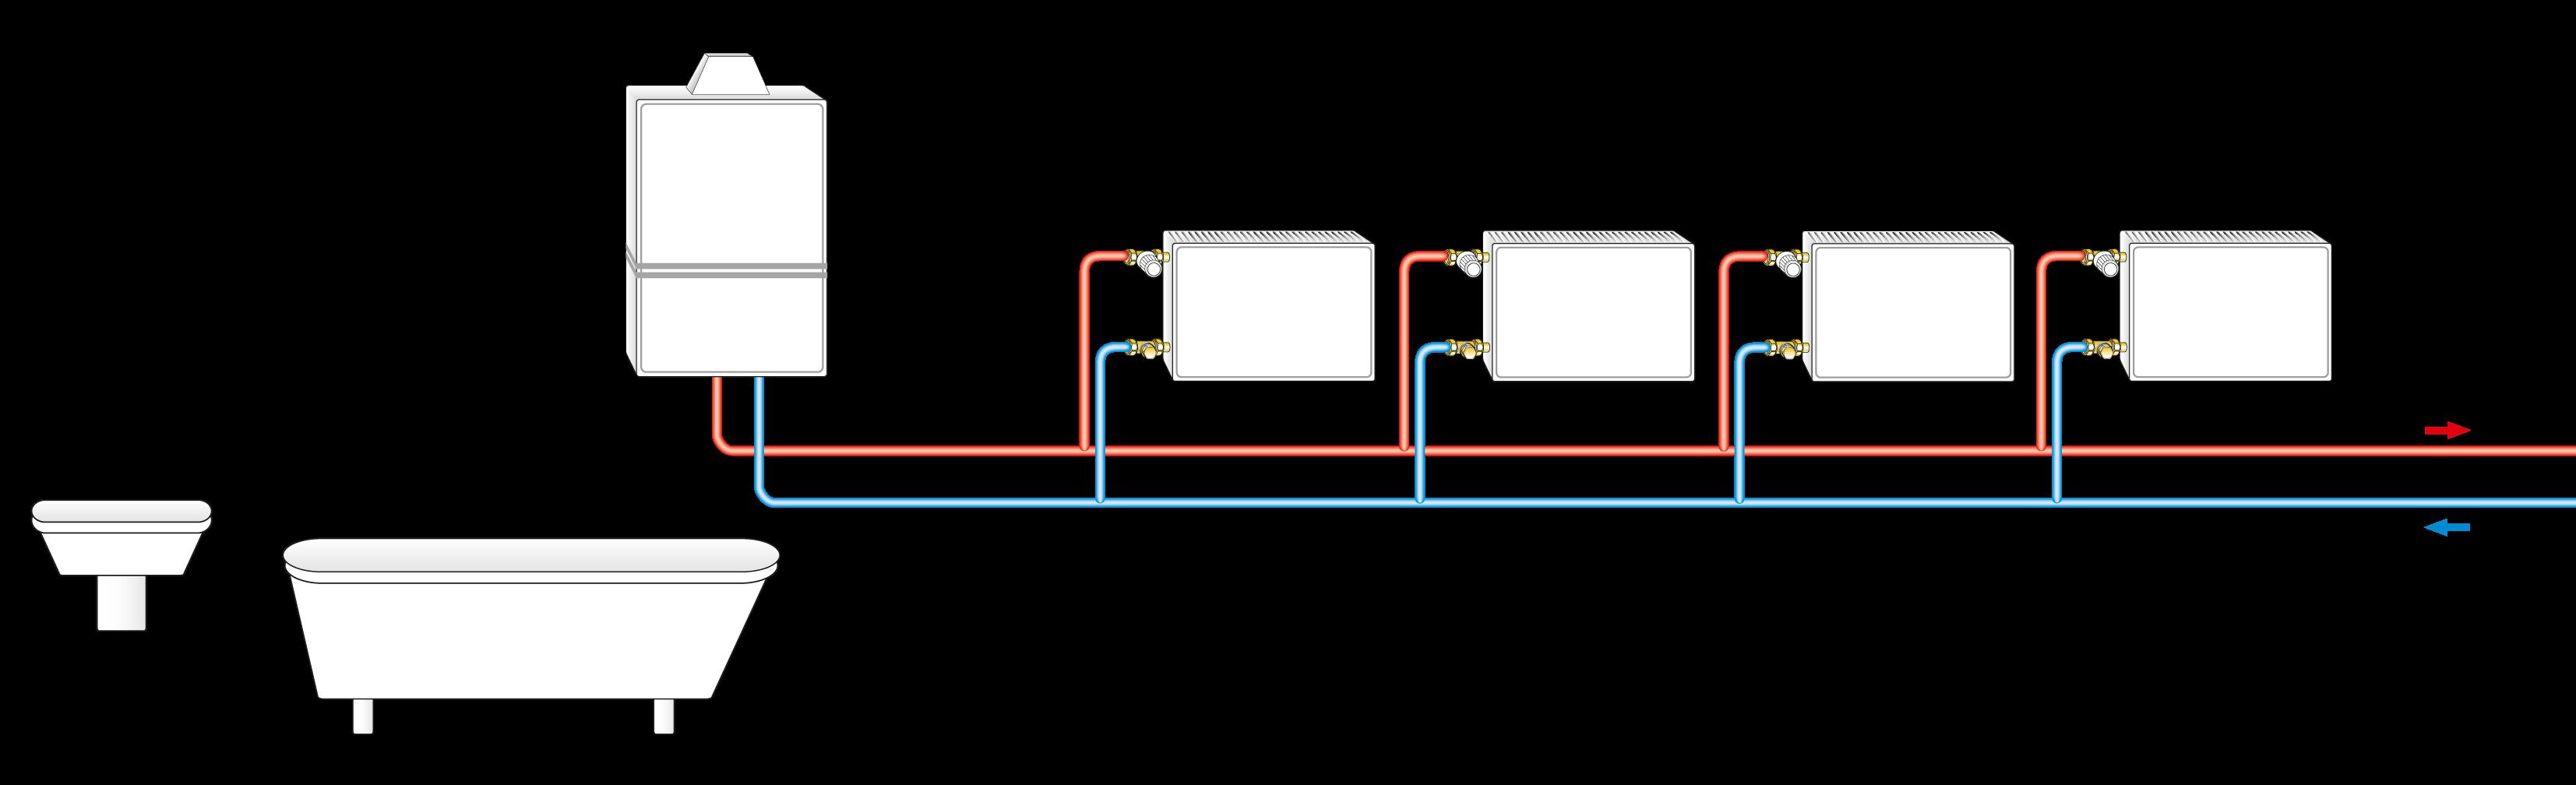 Etagenheizung mit kompaktem Wandheizgerät inkl. Pumpe